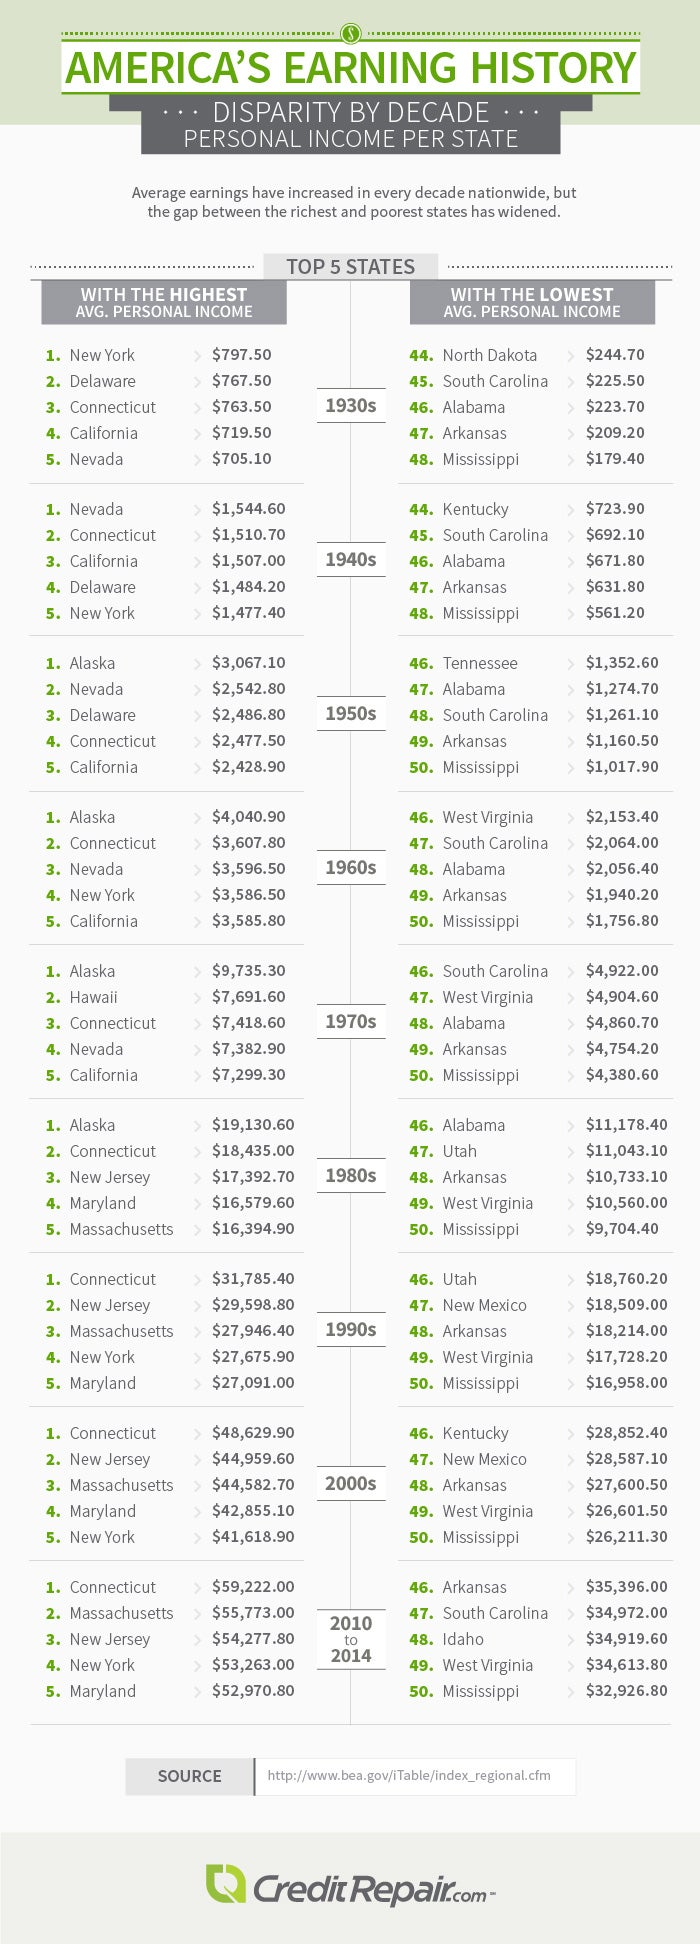 Income per state tables - Imgur